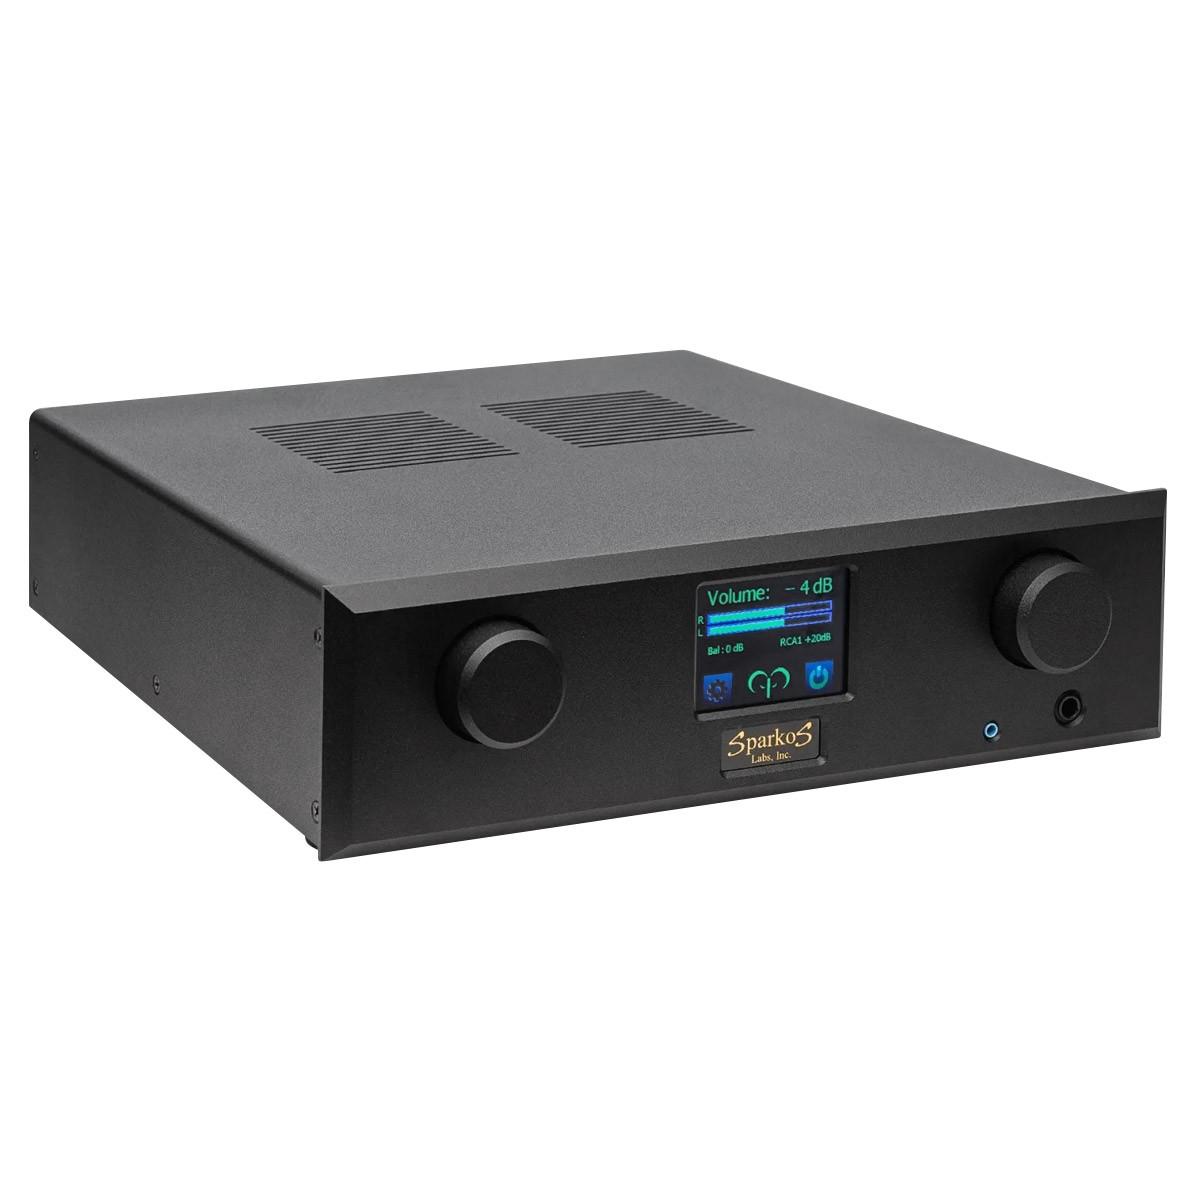 SPARKOS ARIES FULL Discrete Preamplifier Headphone Amplifier